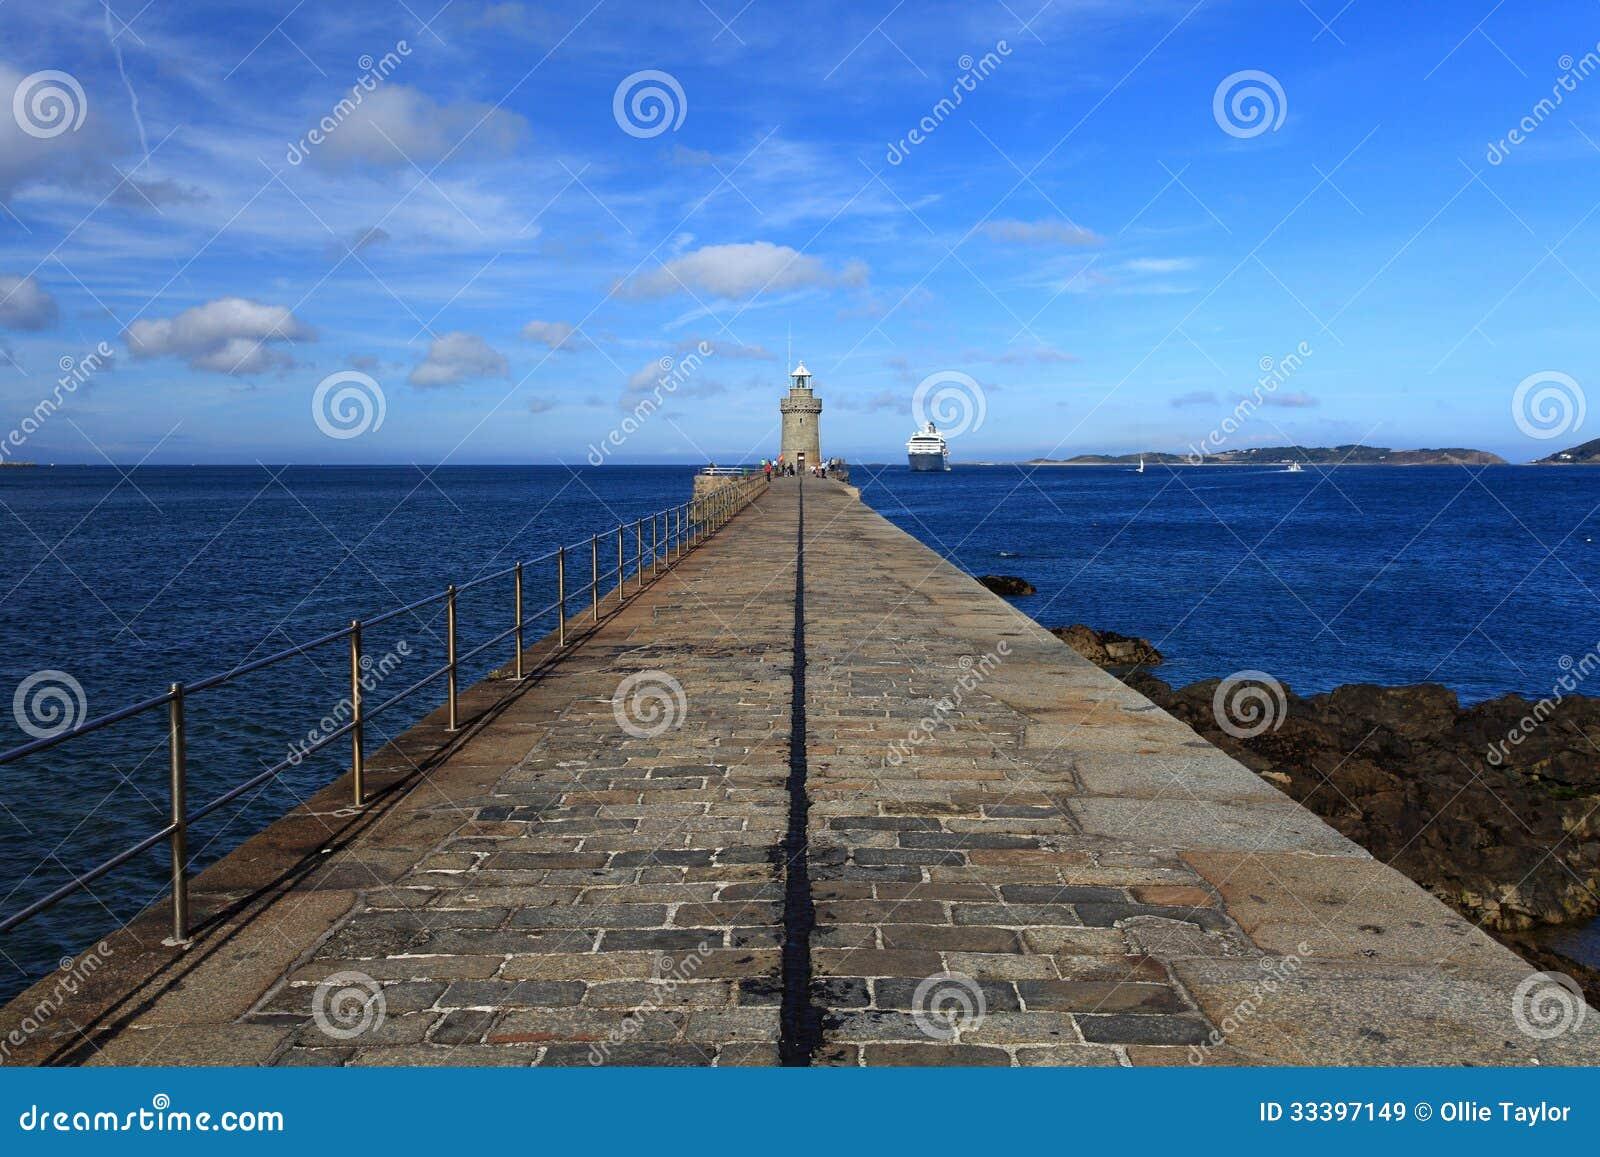 St Peter Port United Kingdom  city photo : St Peter Port Channel Islands United Kingdom.